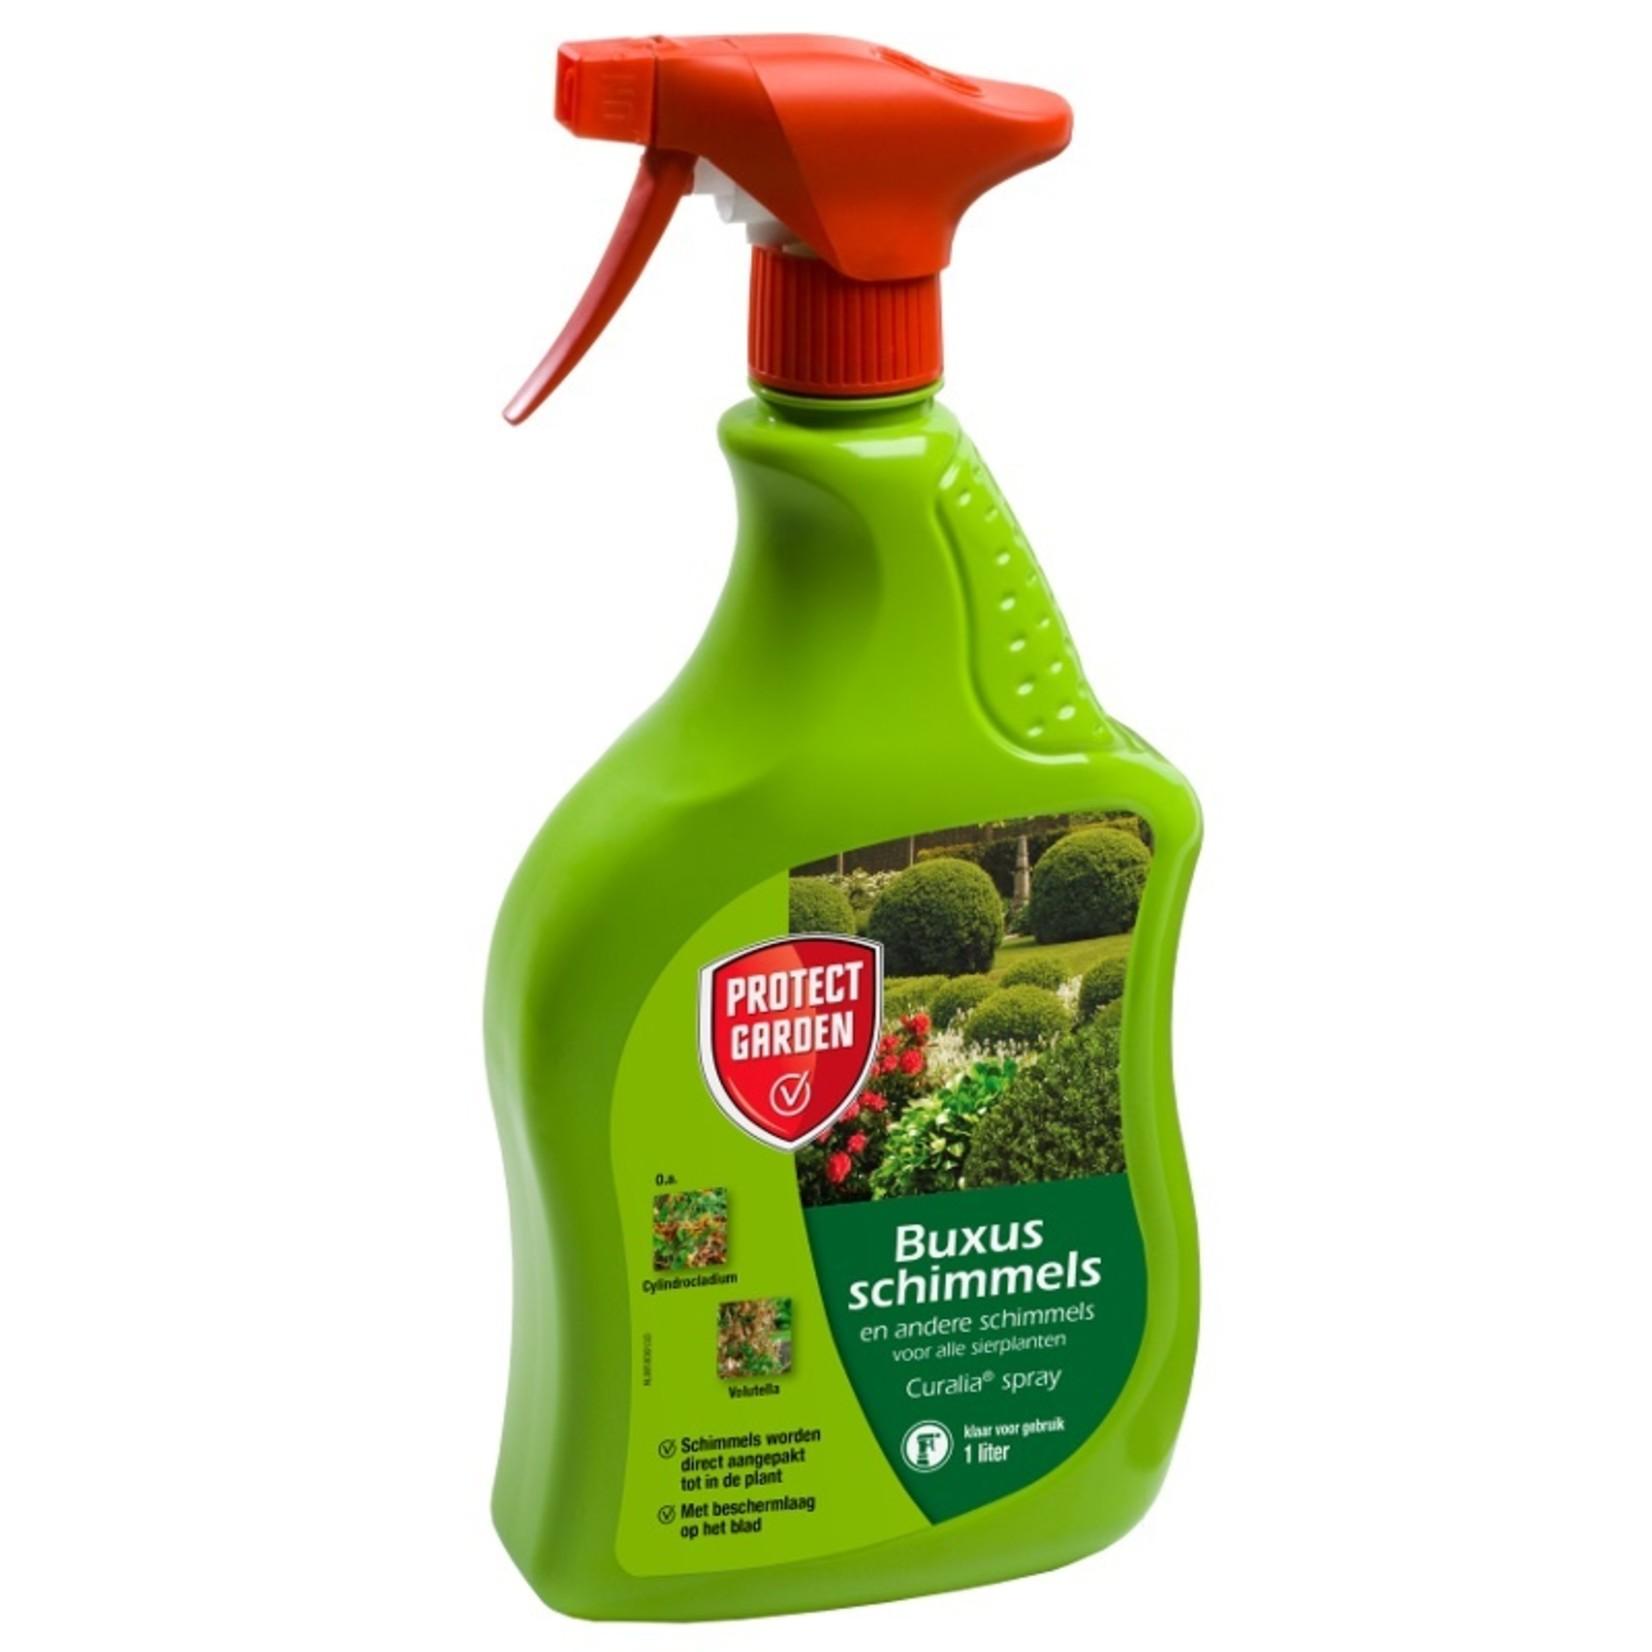 Protect Garden Curalia Twist plus spray Buxus (1 liter) tegen schimmels